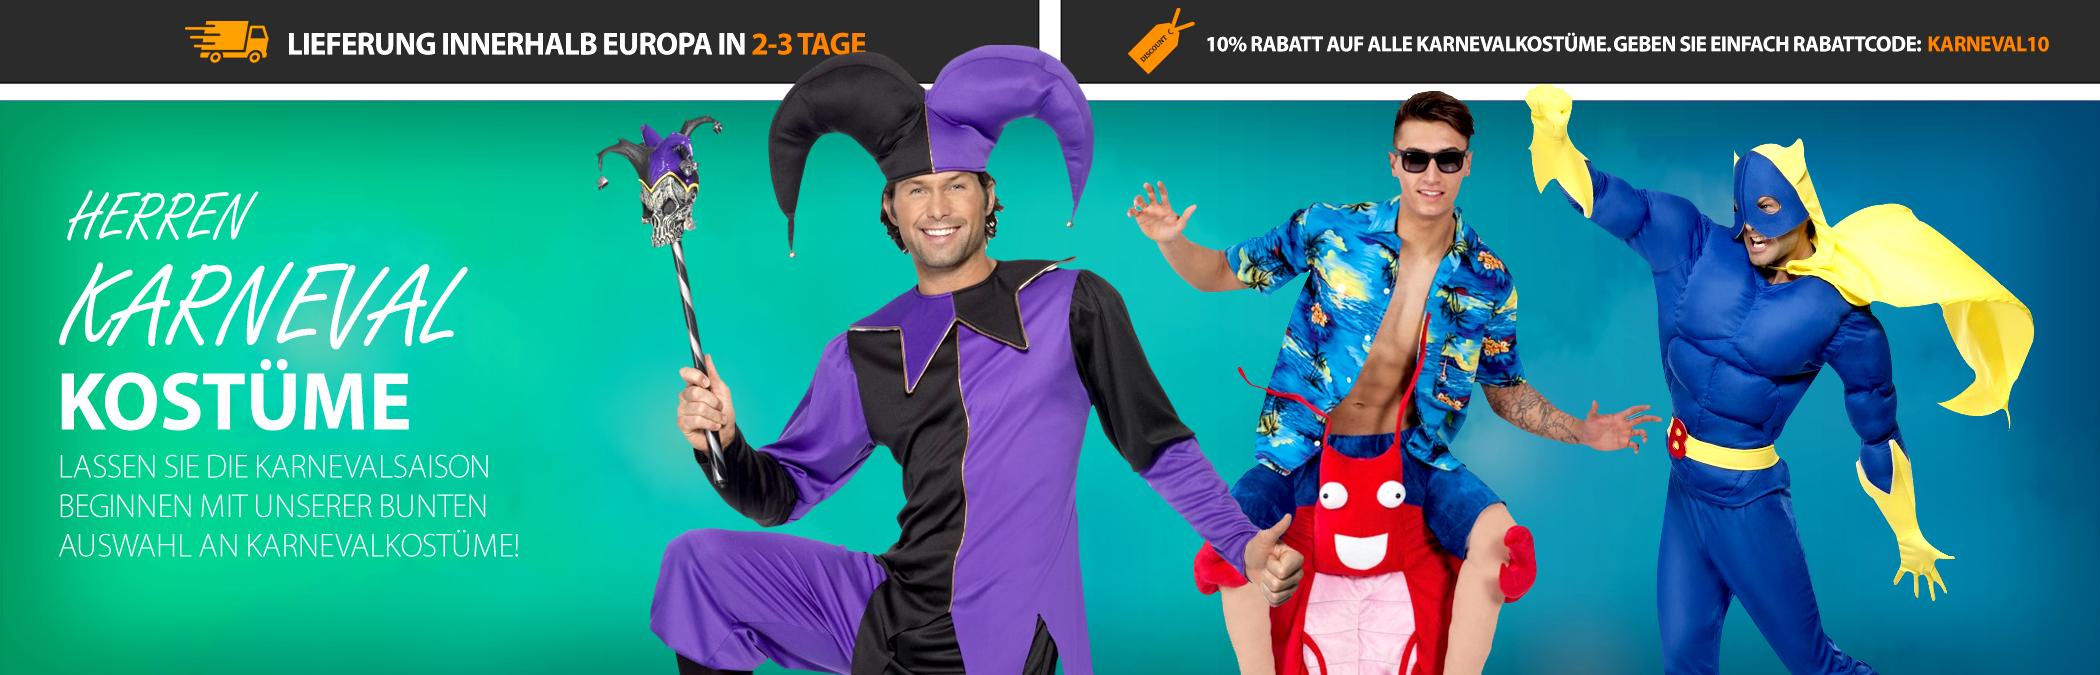 Herren Karneval Kostume Mega Fancy Dress